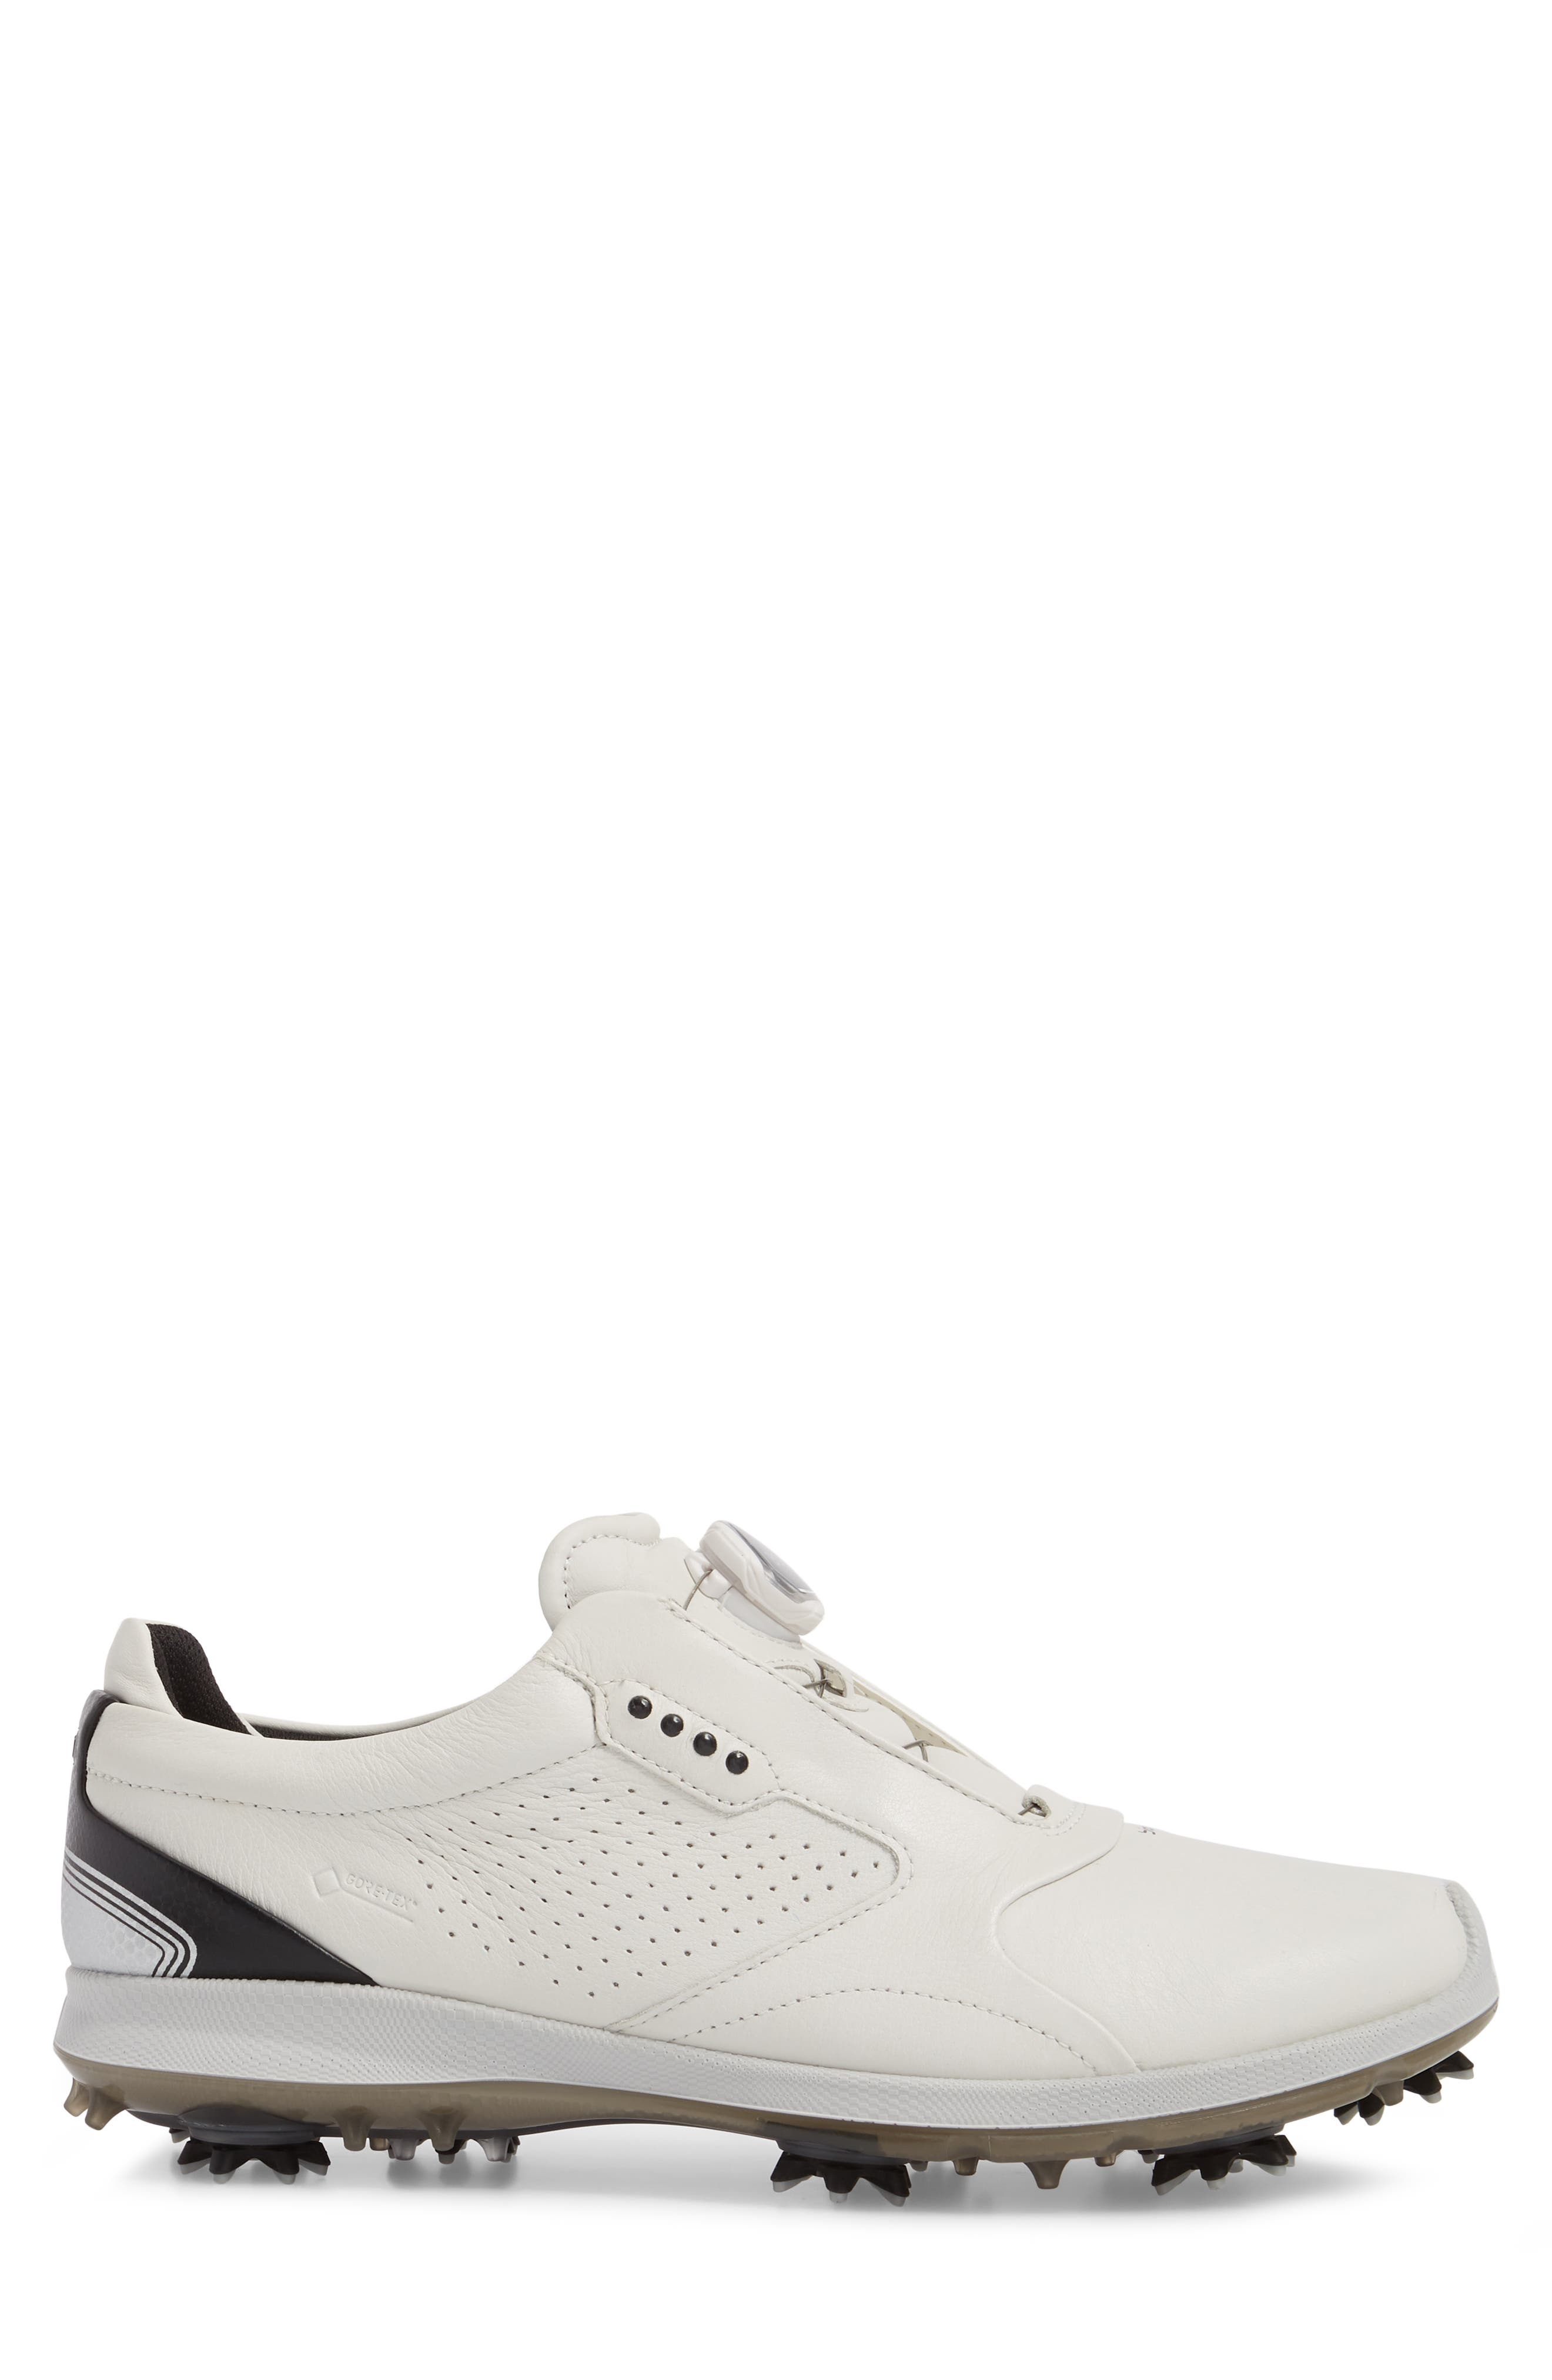 BIOM 2 BOA Gore-Tex<sup>®</sup> Golf Shoe,                             Alternate thumbnail 3, color,                             WHITE/ BLACK LEATHER